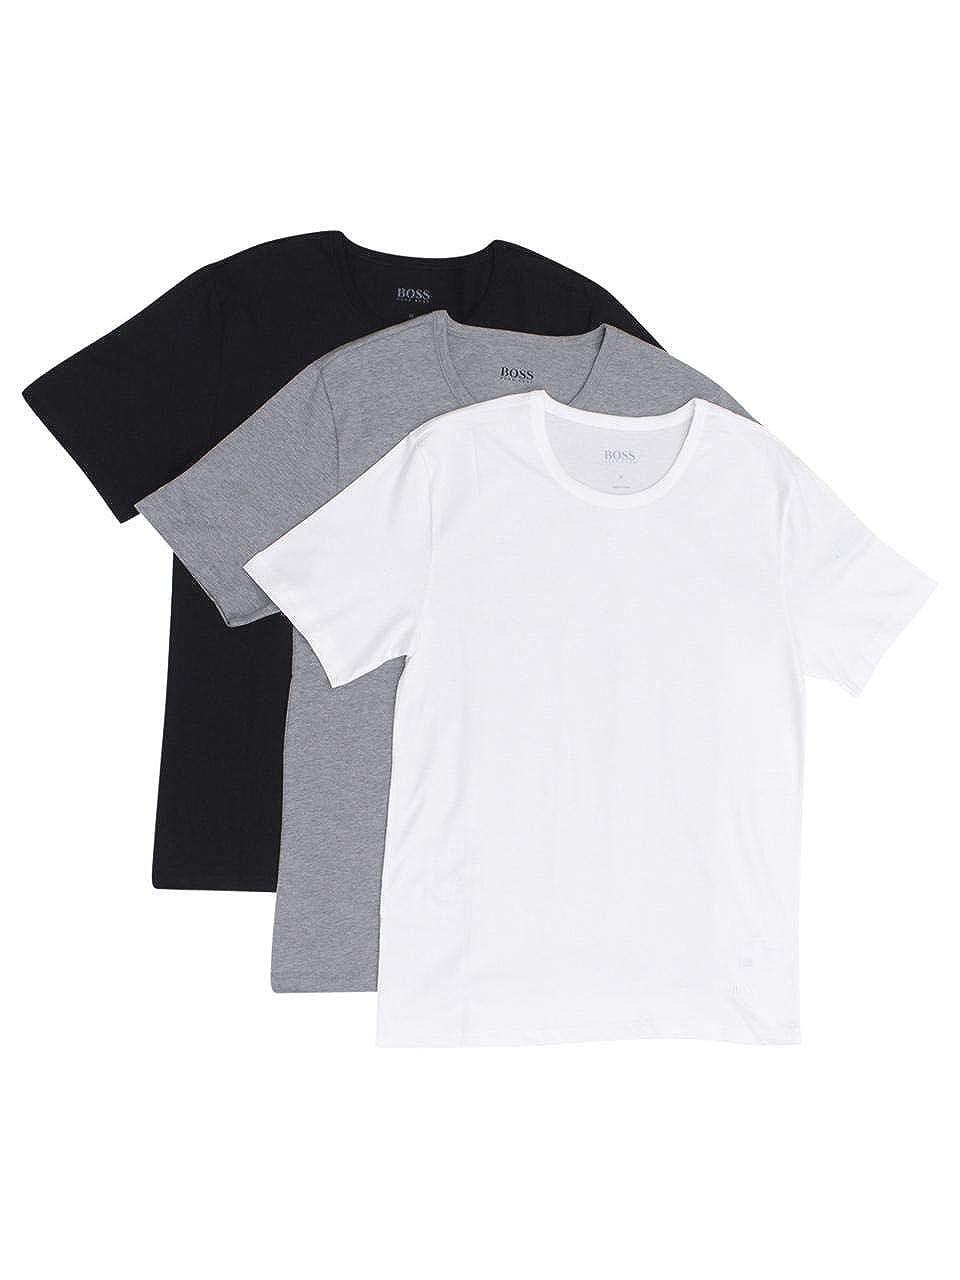 72d43094 Amazon.com: Hugo Boss Men's 3-Pack Round Neck Regular Fit Short Sleeve T- Shirts: Clothing